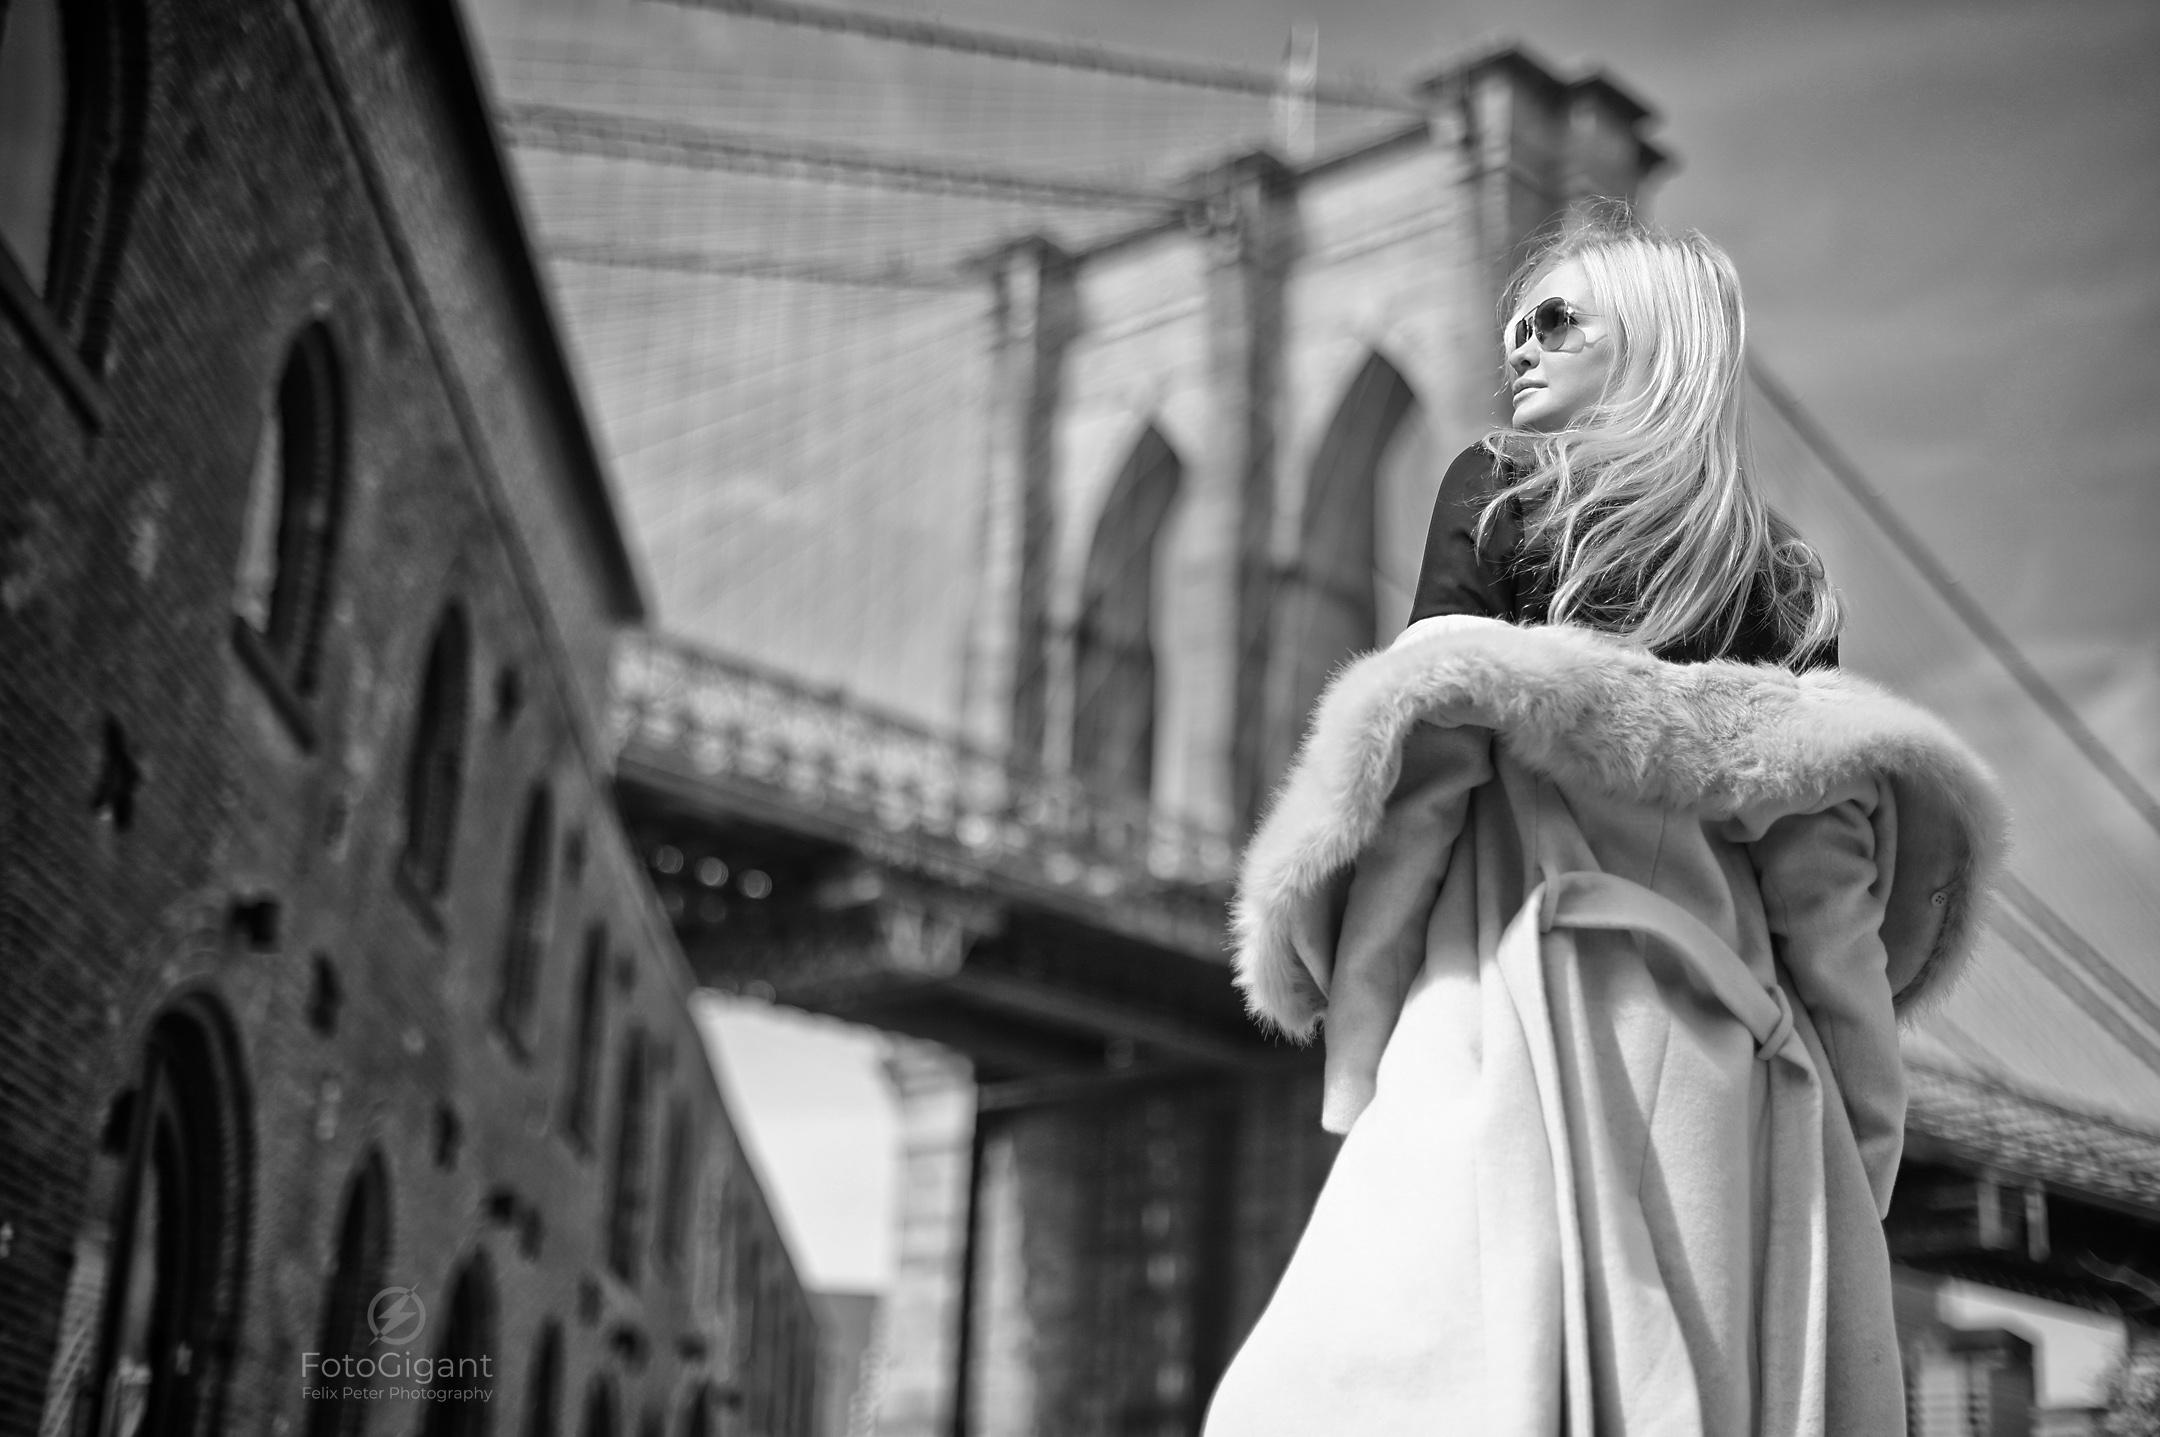 NewYork_JuliaKolomiyets_Fashionphotography_21.jpg